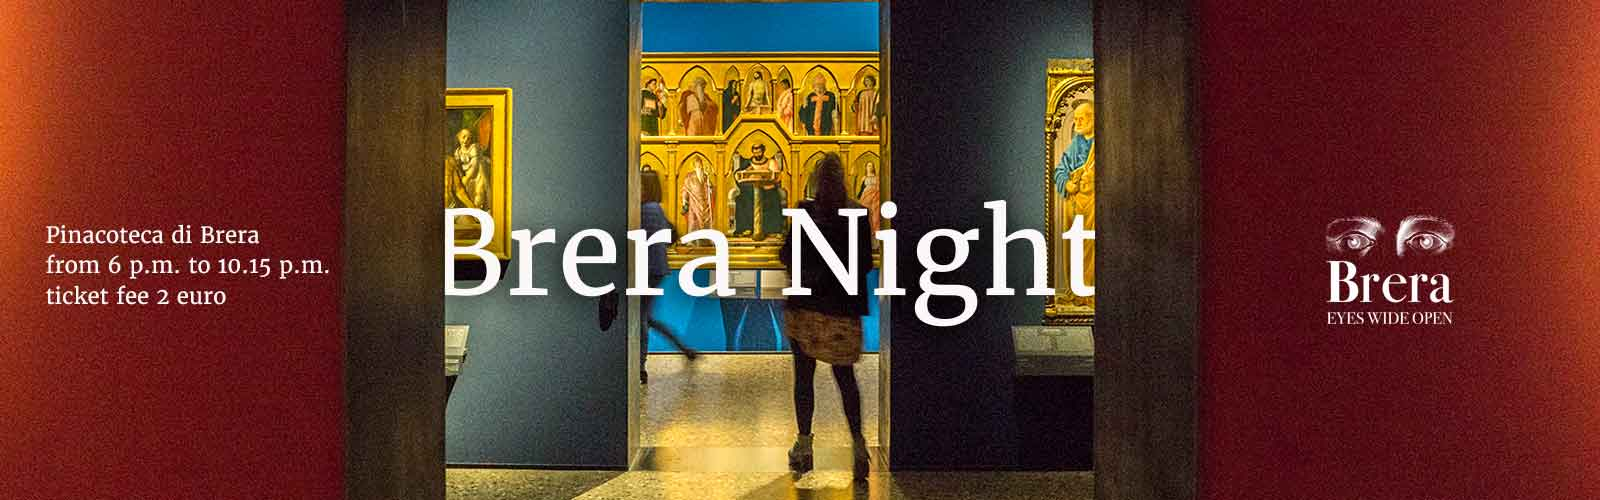 Brera Night with 2 euro